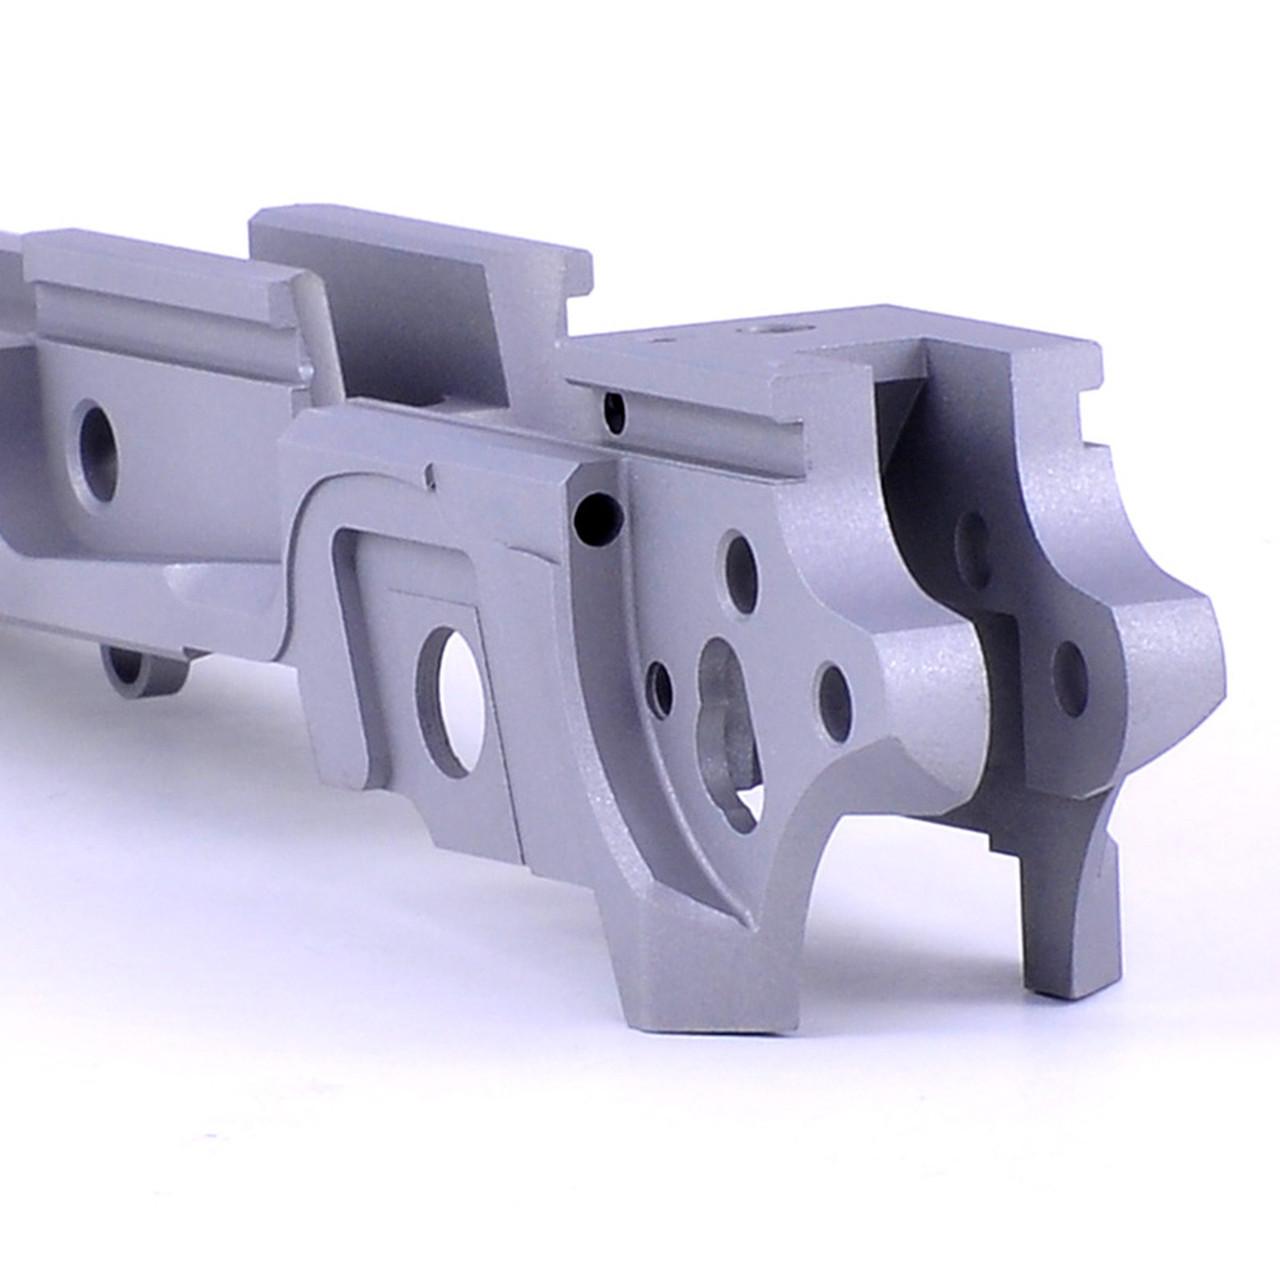 Cheely Custom Gunworks XWF Serialized Frame - Heavy (Wilson Nowlin) (Restricted Firearm)